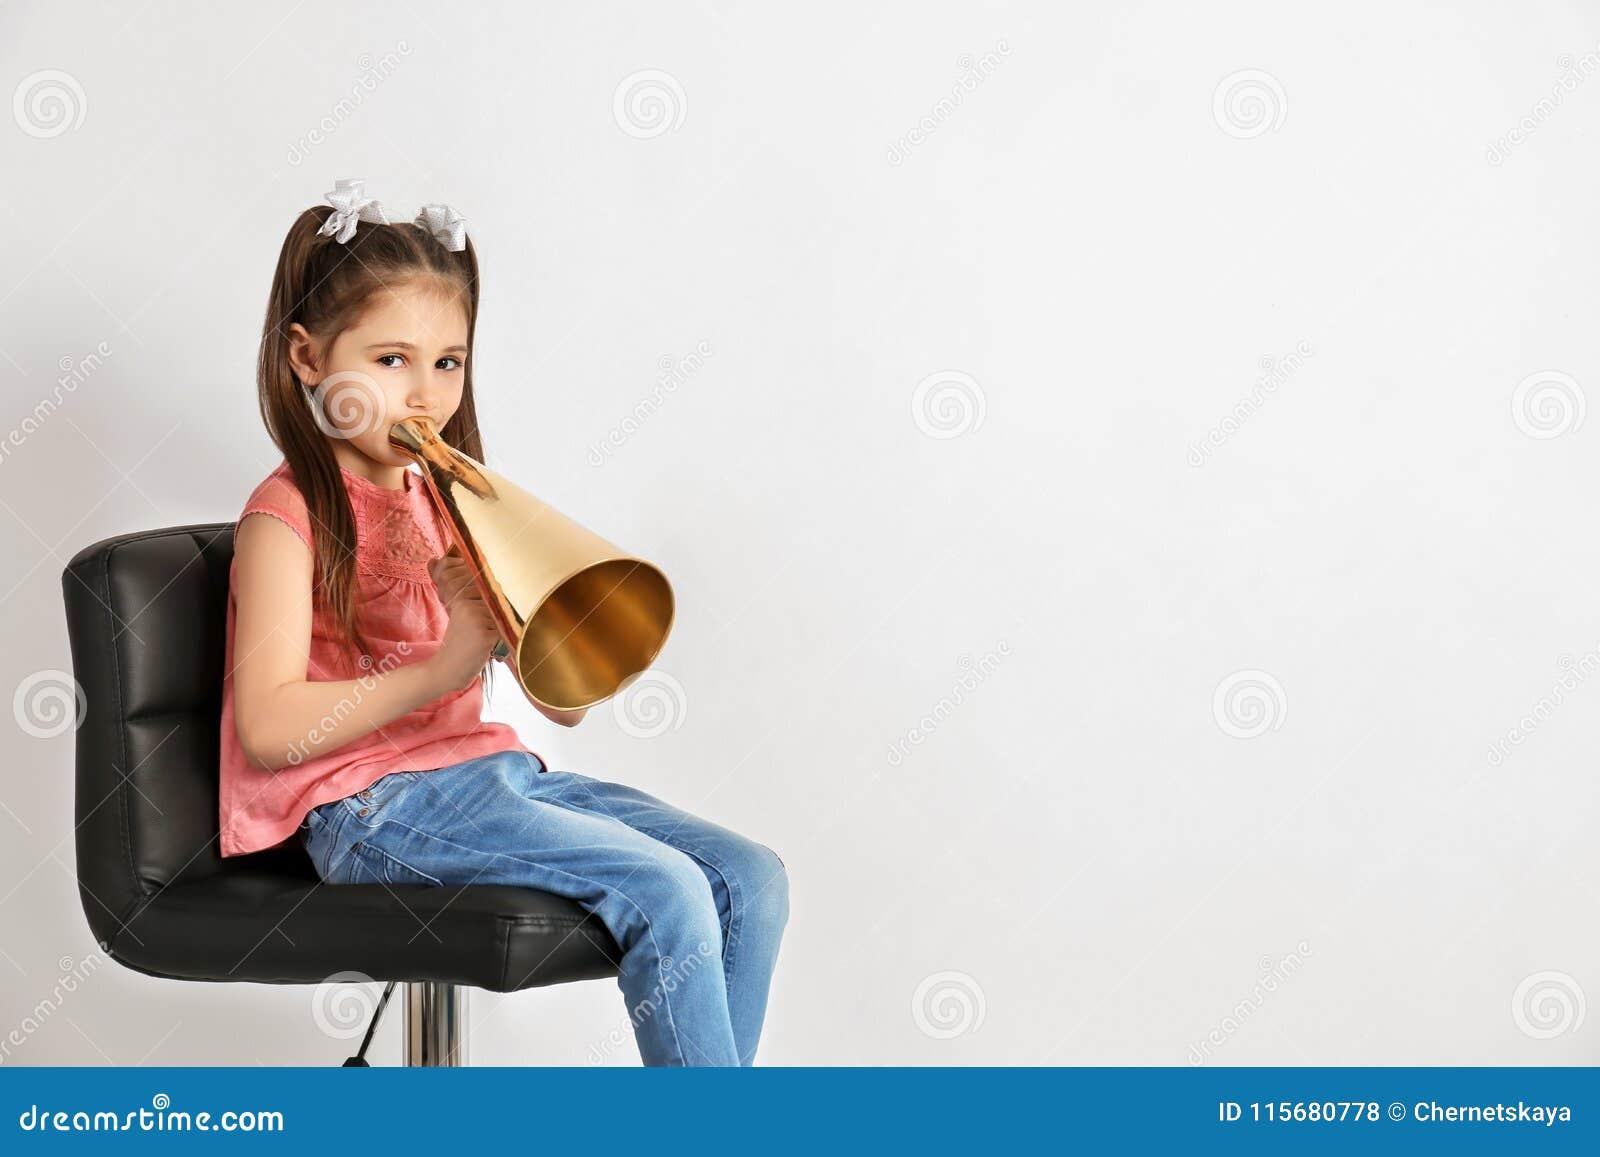 Cute little girl with megaphone